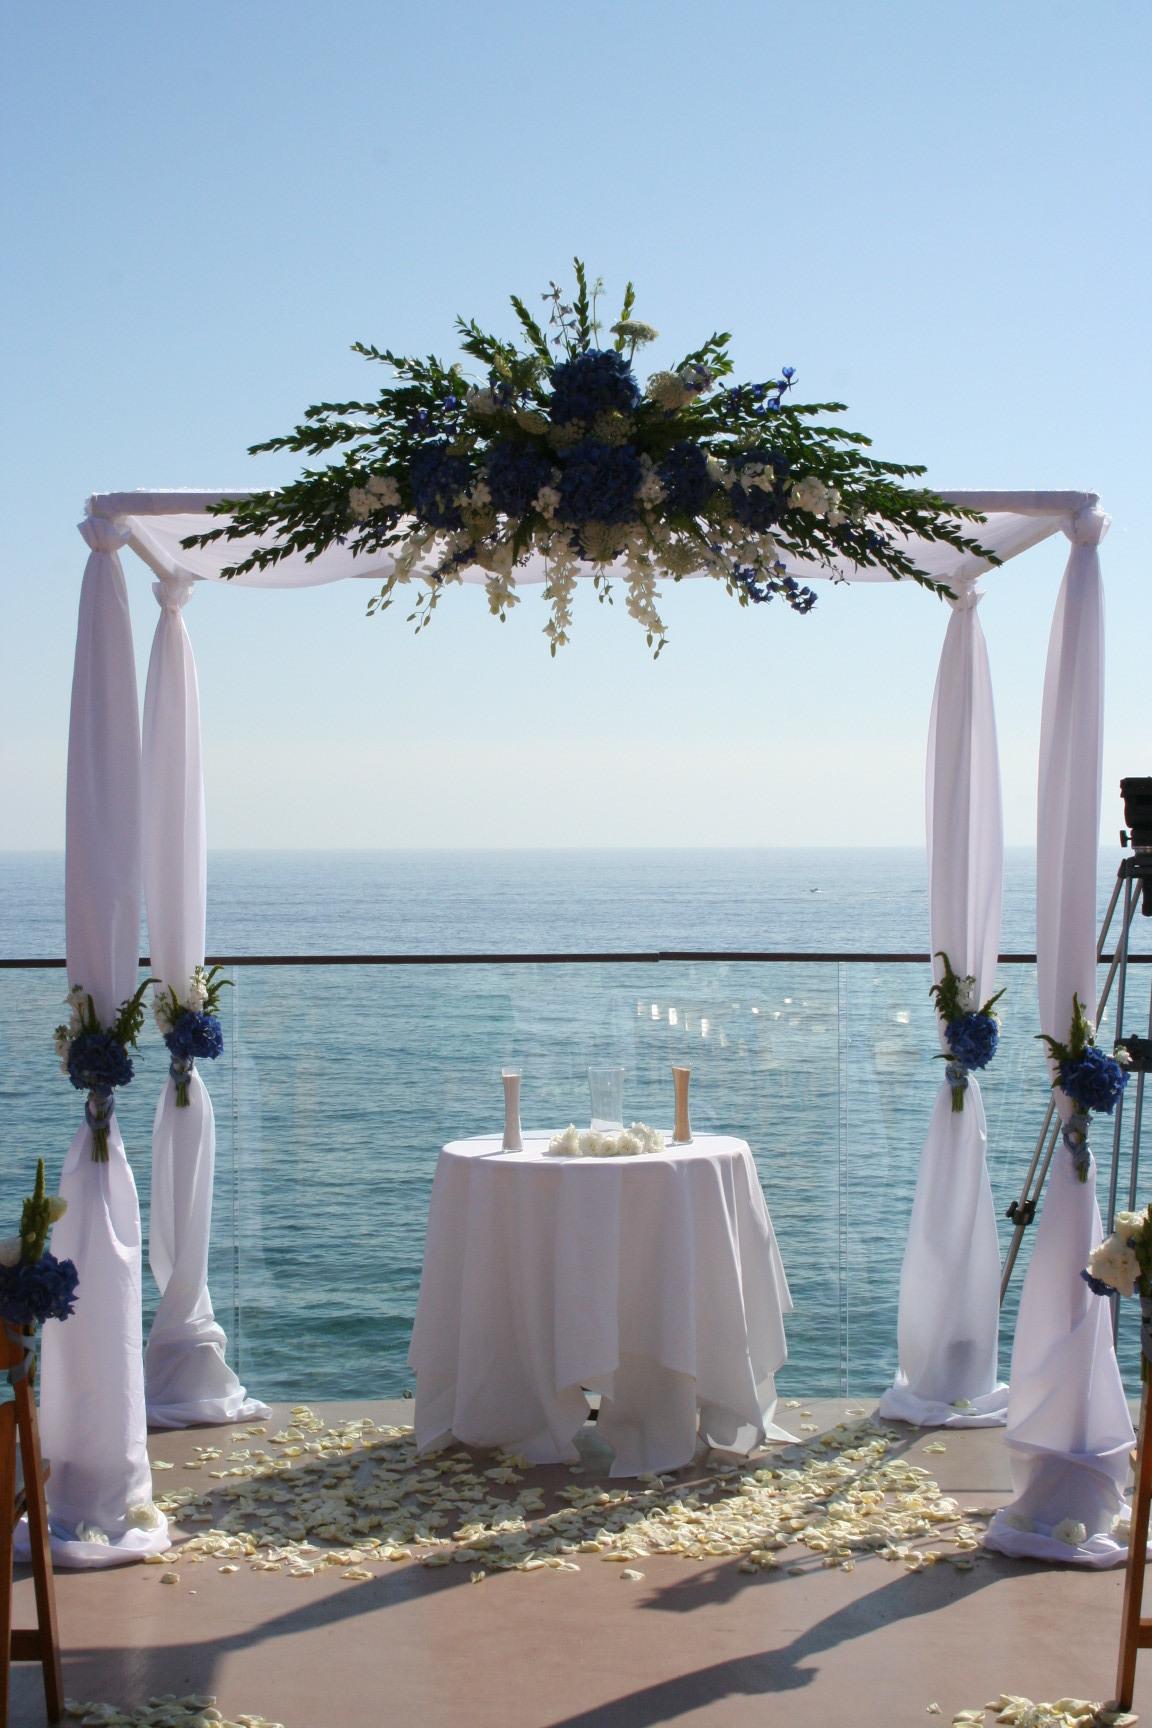 Ceremony, Flowers & Decor, white, blue, green, Ceremony Flowers, Flowers, Unique, Floral, Designer, Ocean, Design, Florist, Sea, Maria, Masterson, Hoopa